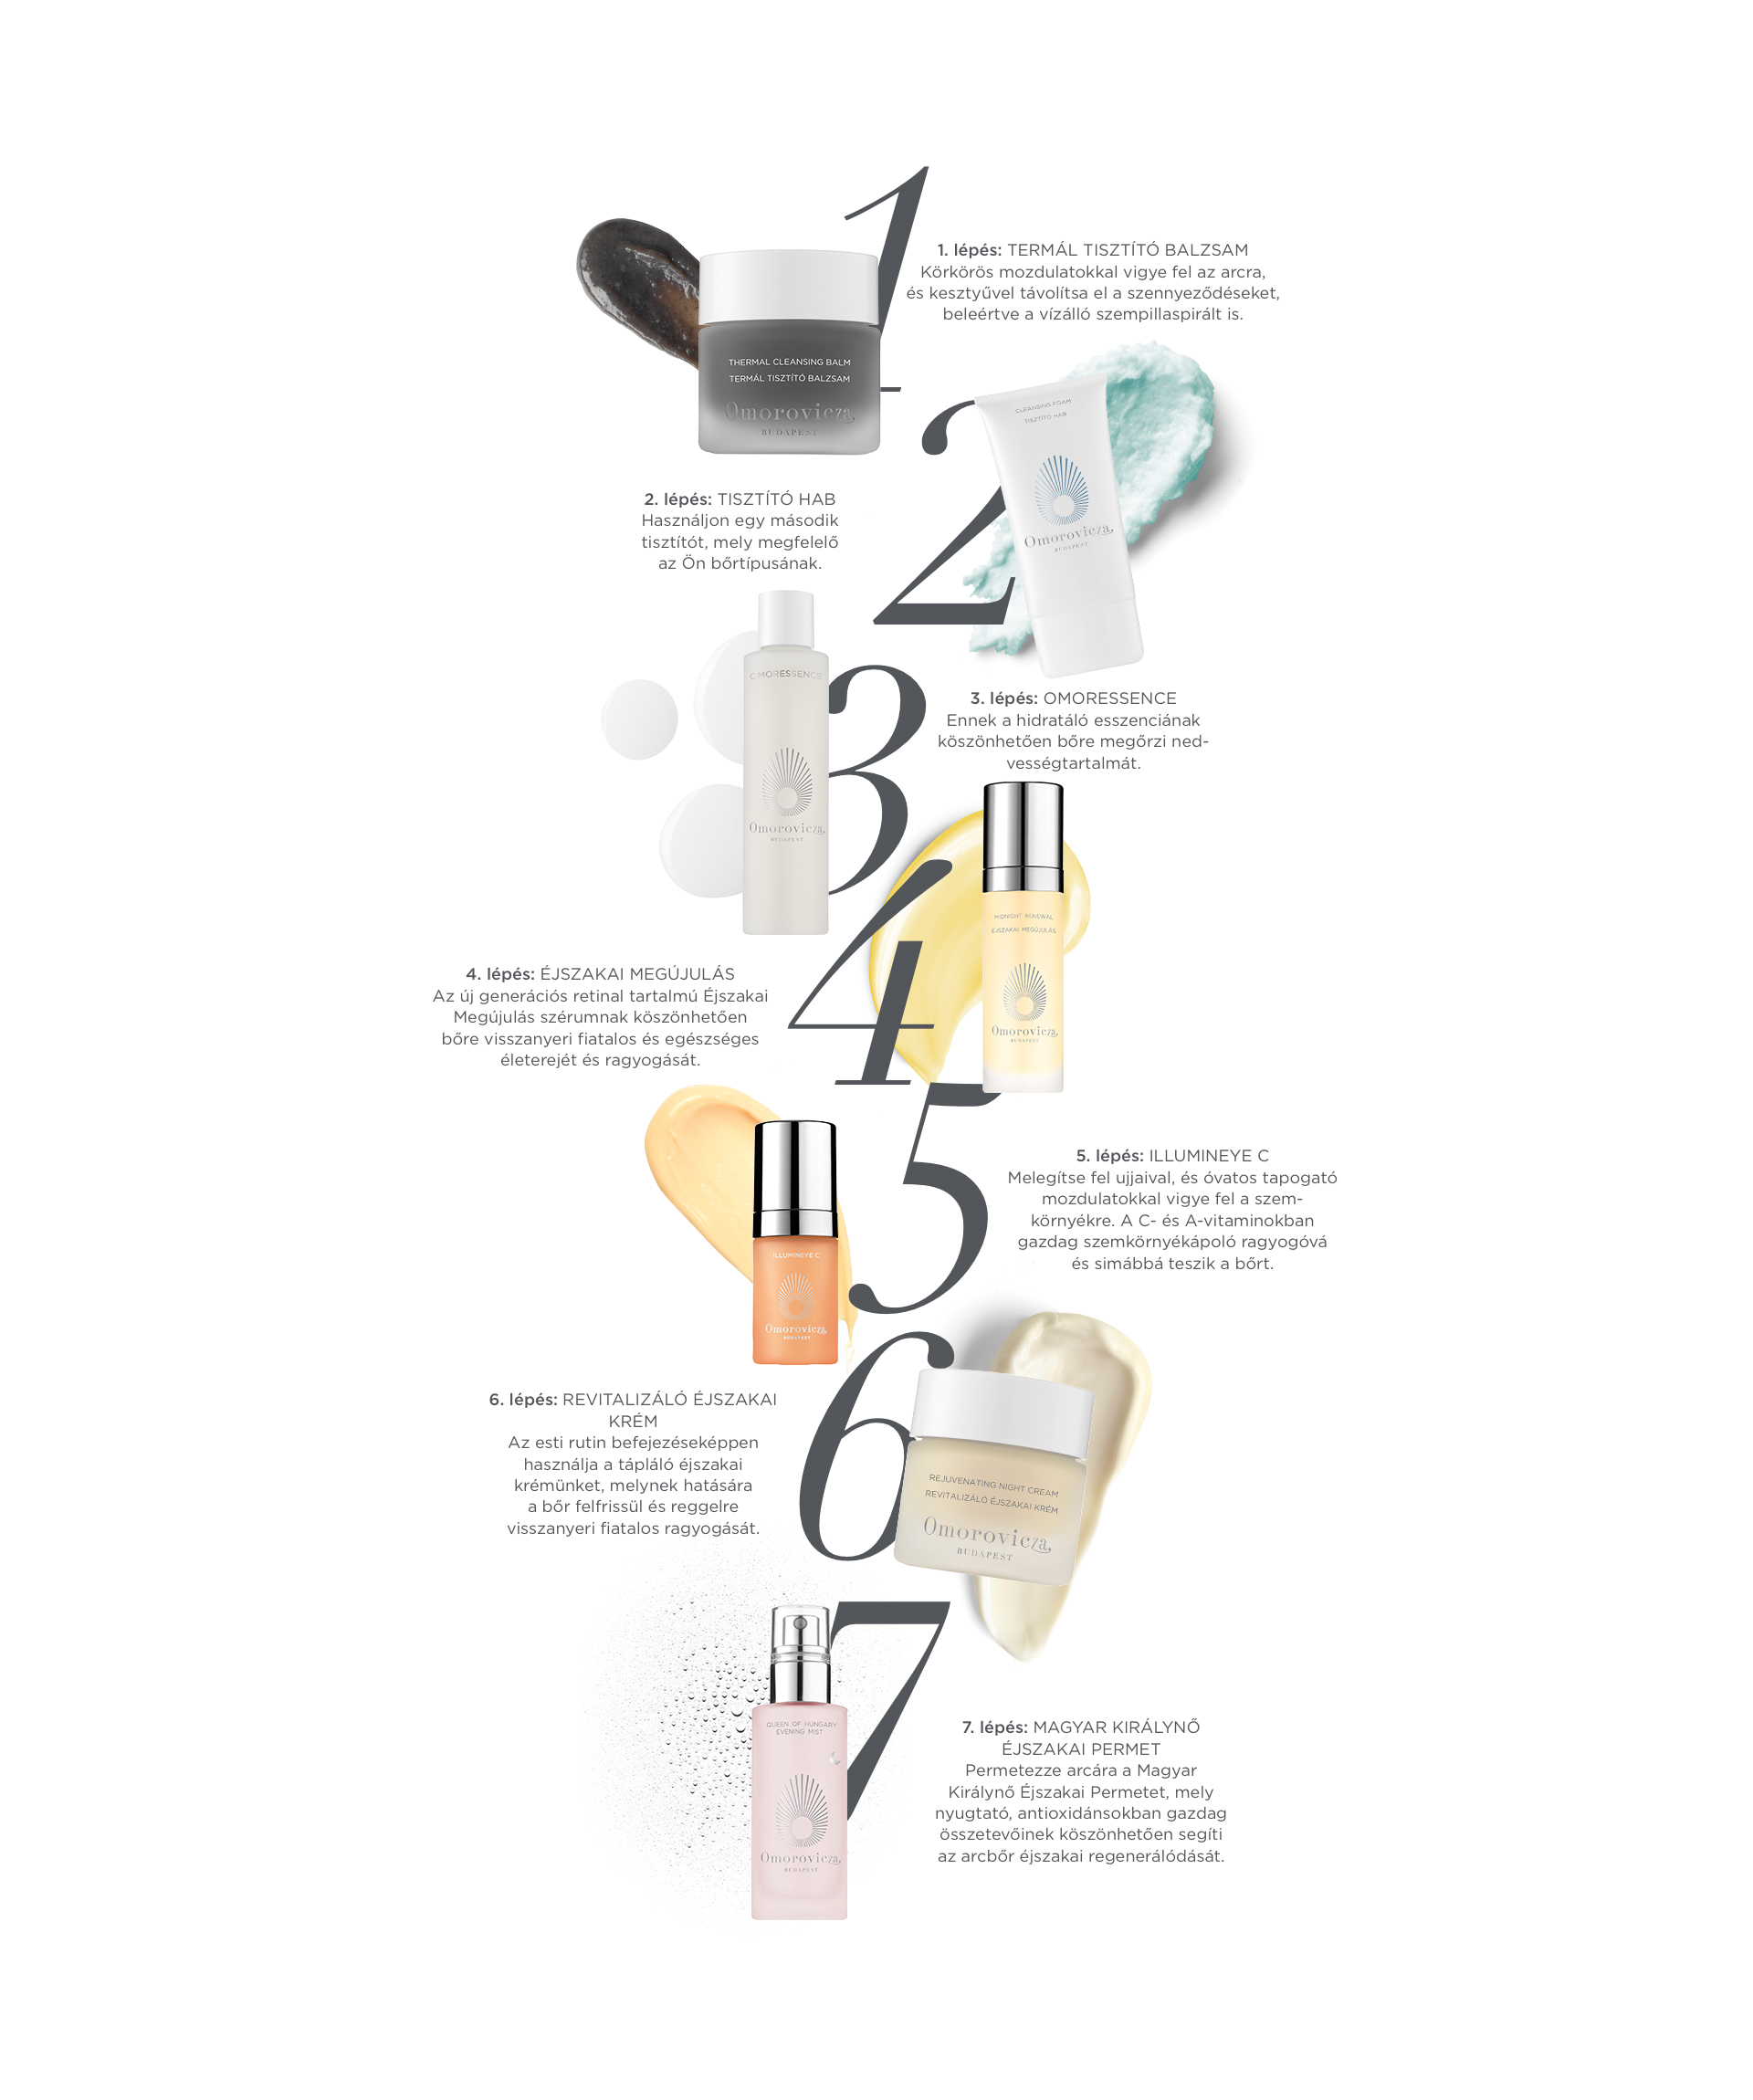 Omorovicza 7 step night-time skincare routine guide